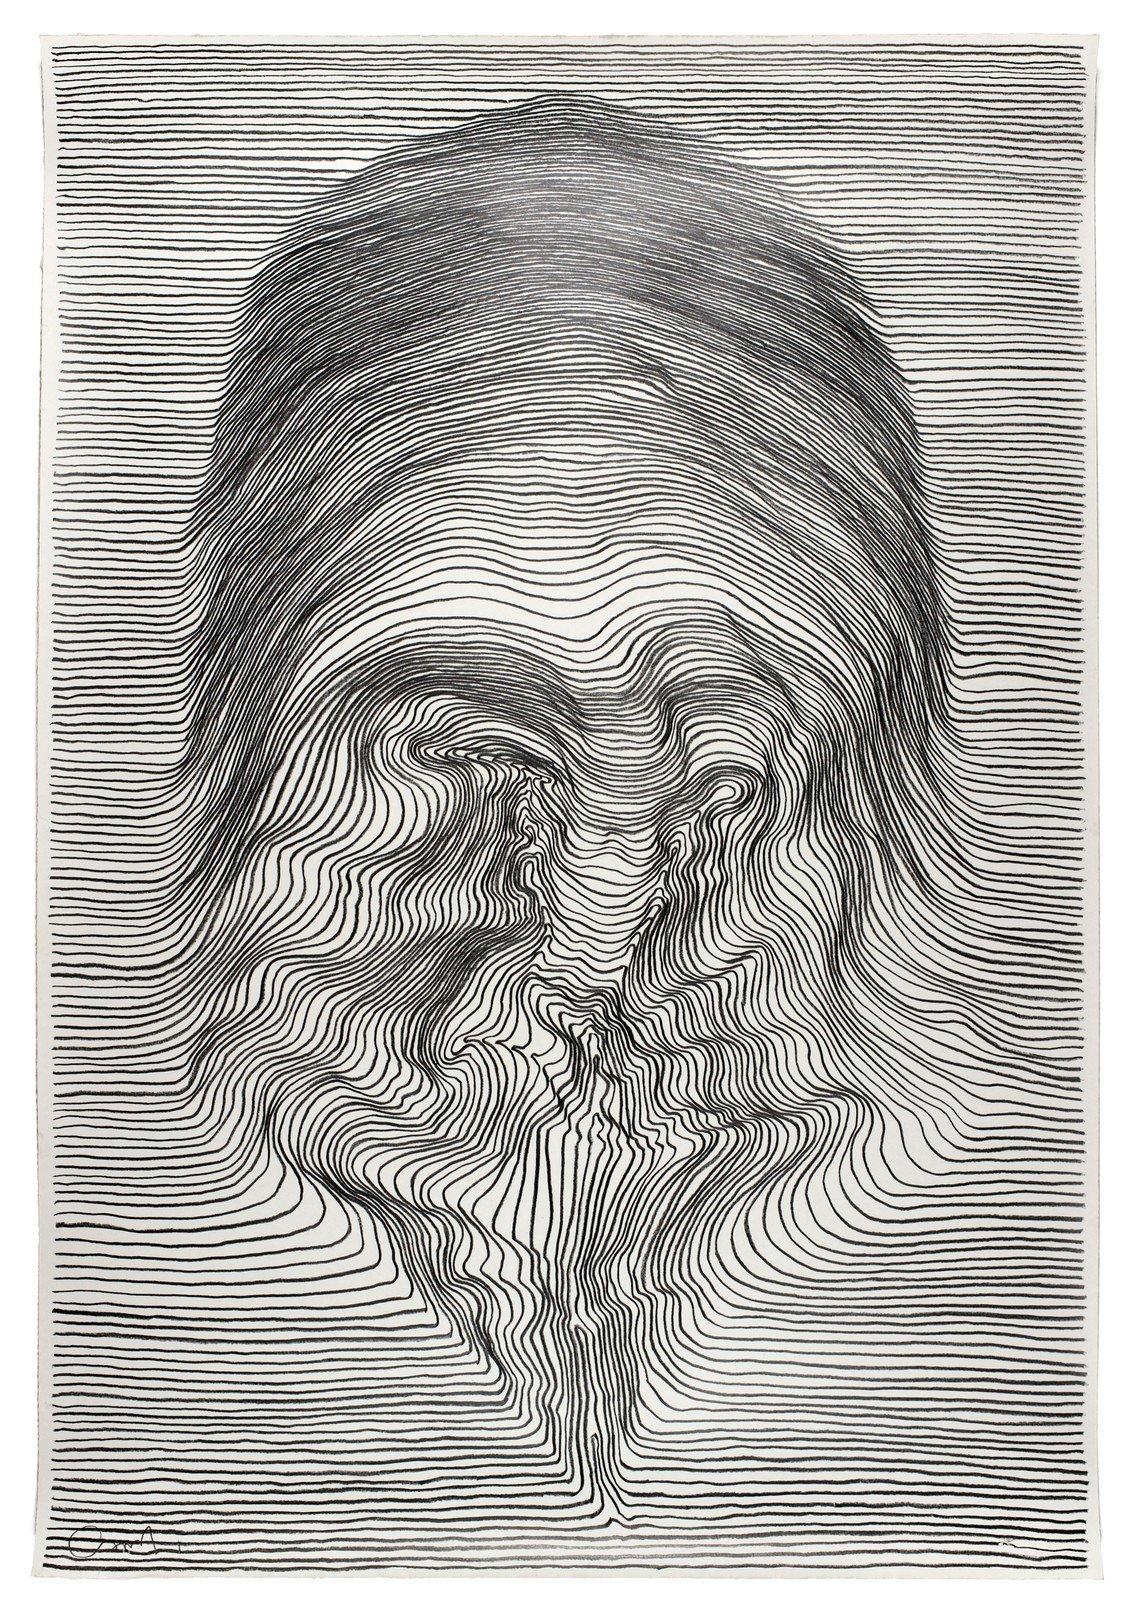 Carl Krull - Oldmec #5